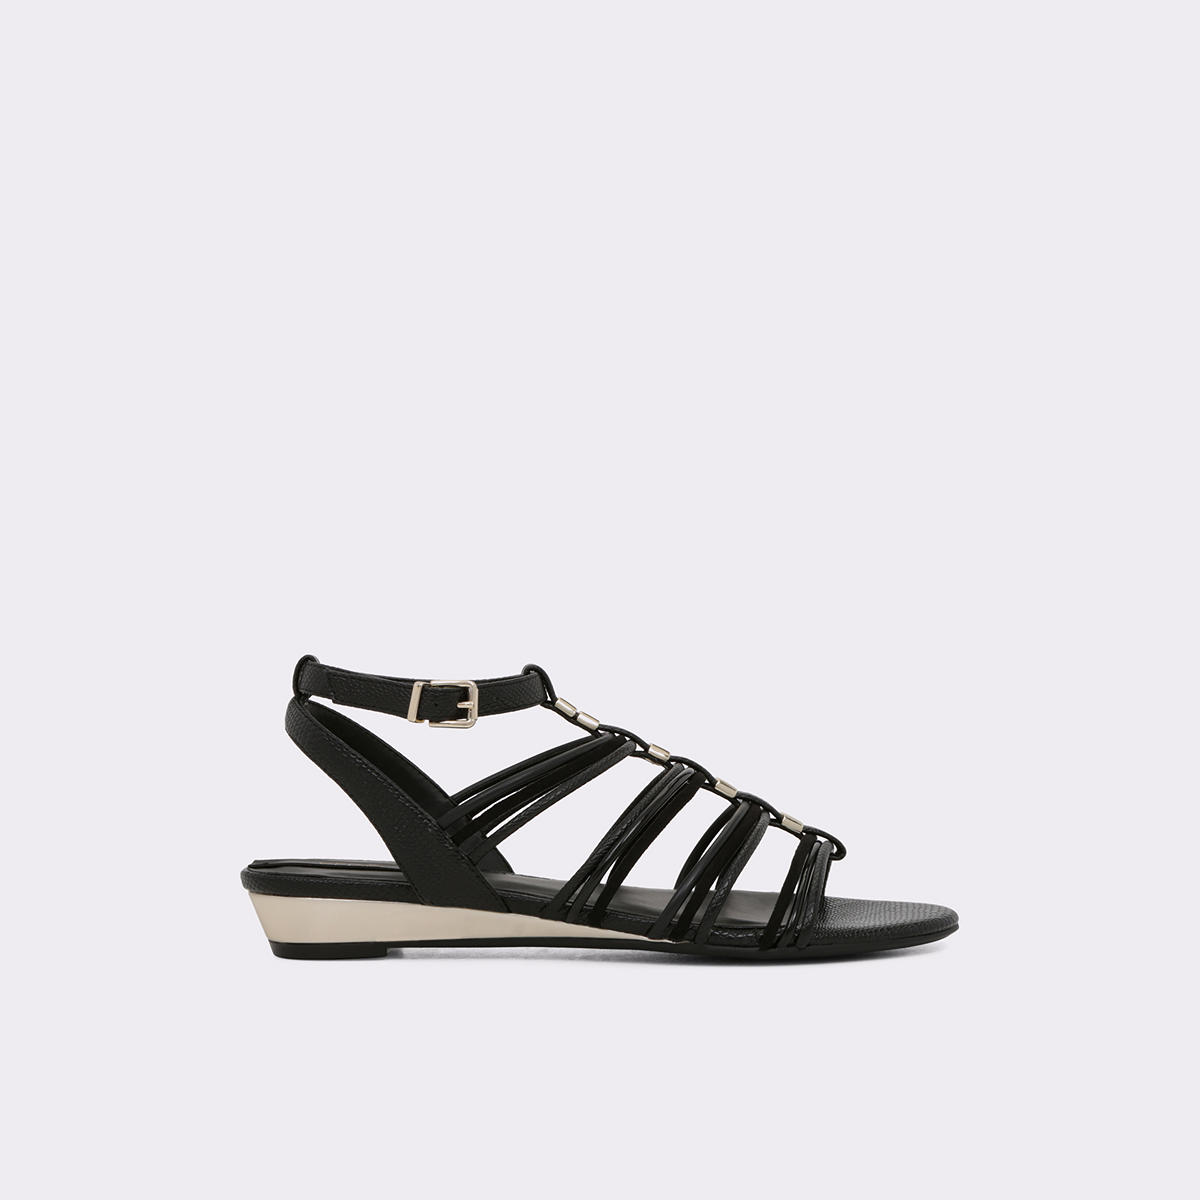 d71ef342958f Mazie Black Multi Women s Sandals